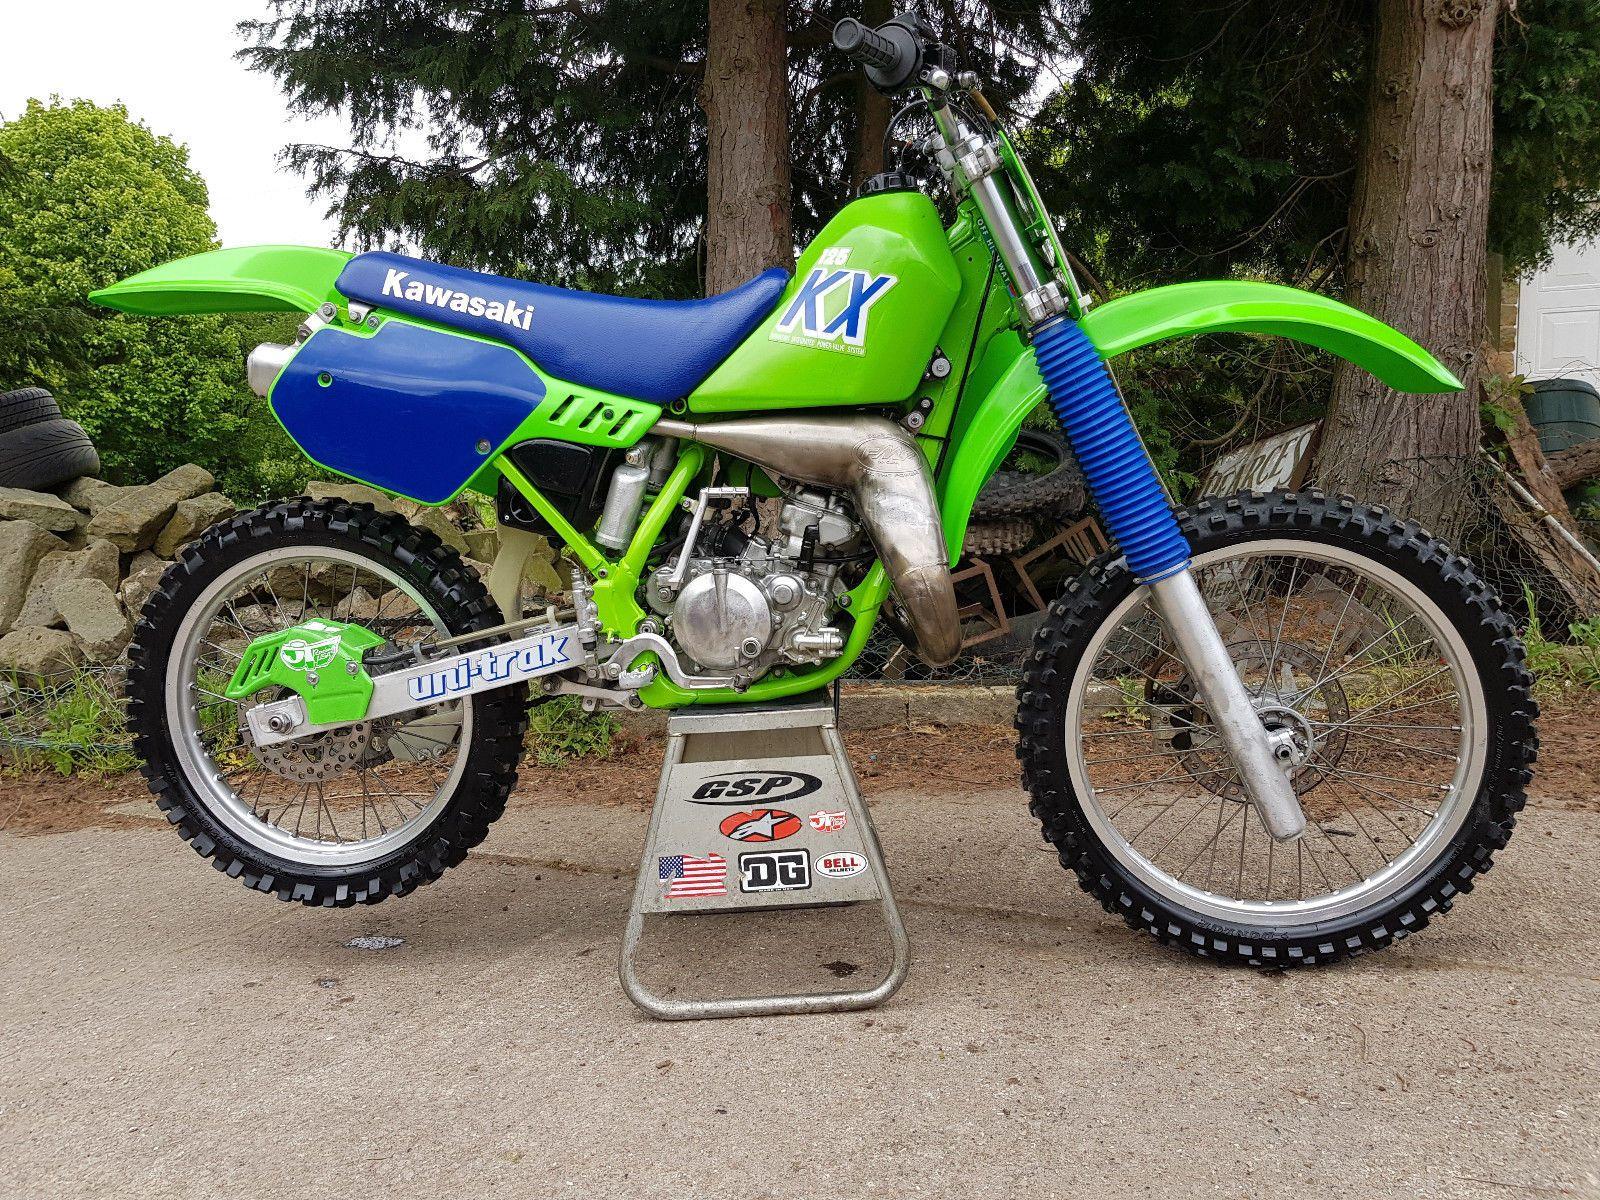 eBay: 1989 American Spec Kawasaki KX125 IMPORTED from California Evo super  evo LOOK !